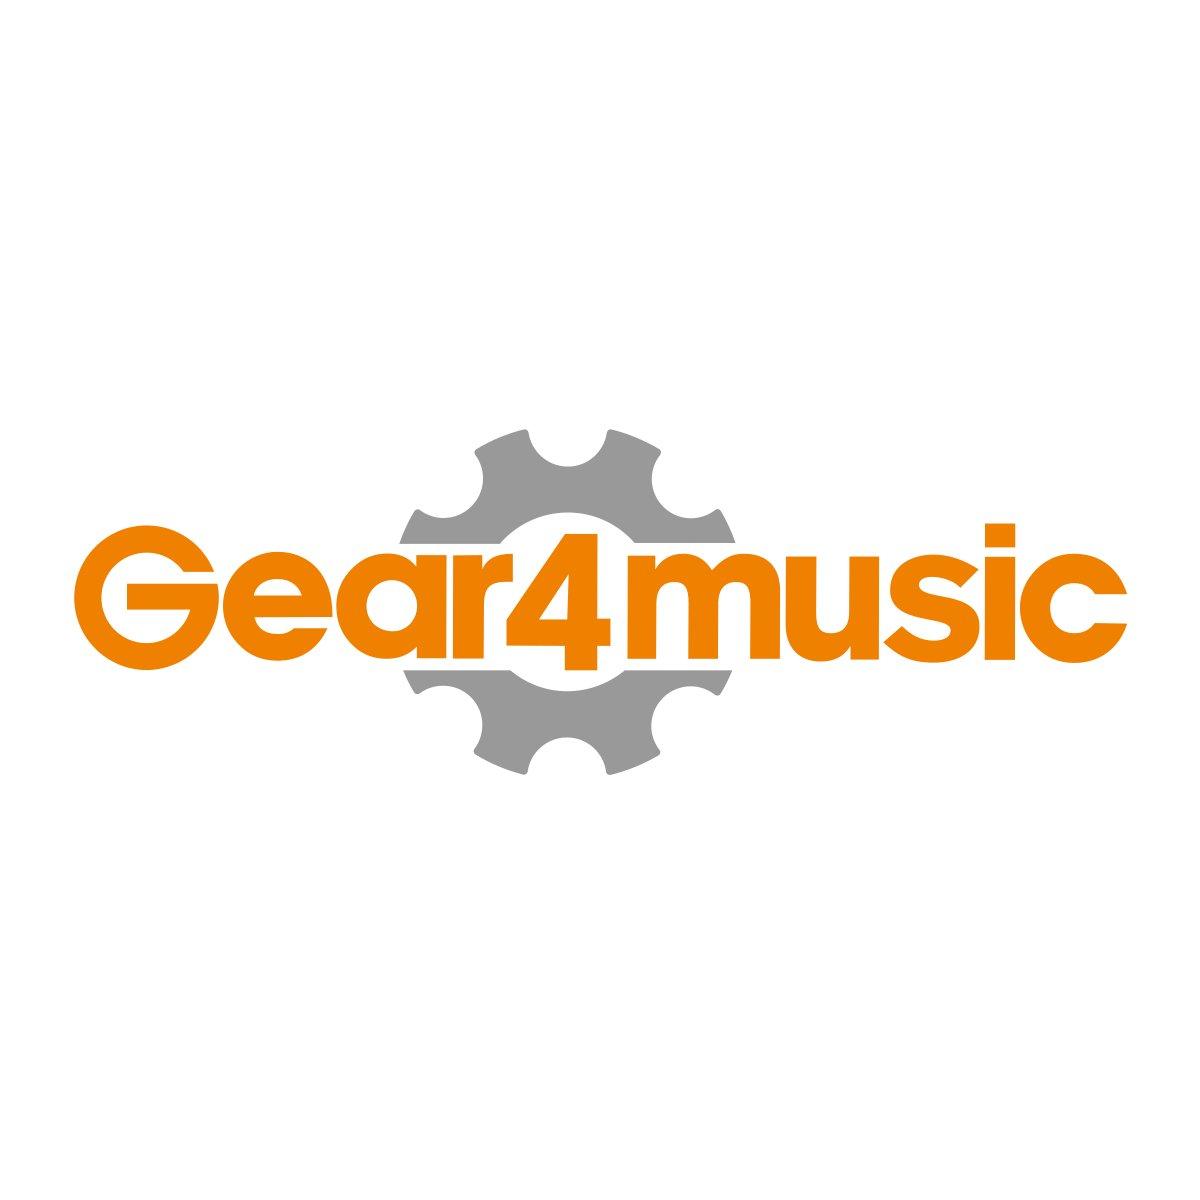 Classical Guitar, Black, by Gear4music